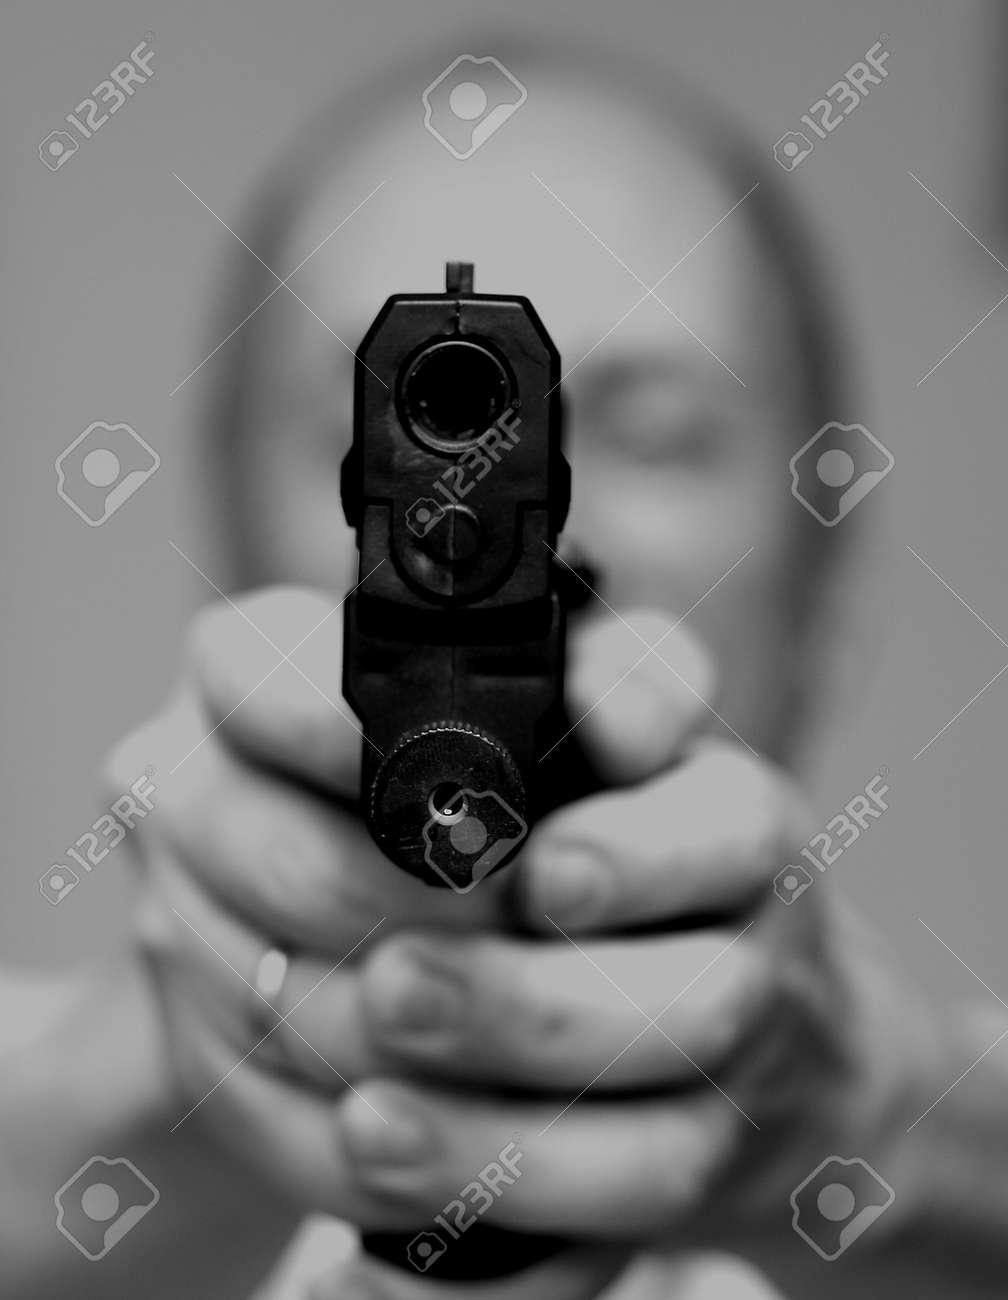 Man with a gun.Old man pointing a gun towards the camera. Stock Photo - 9617364